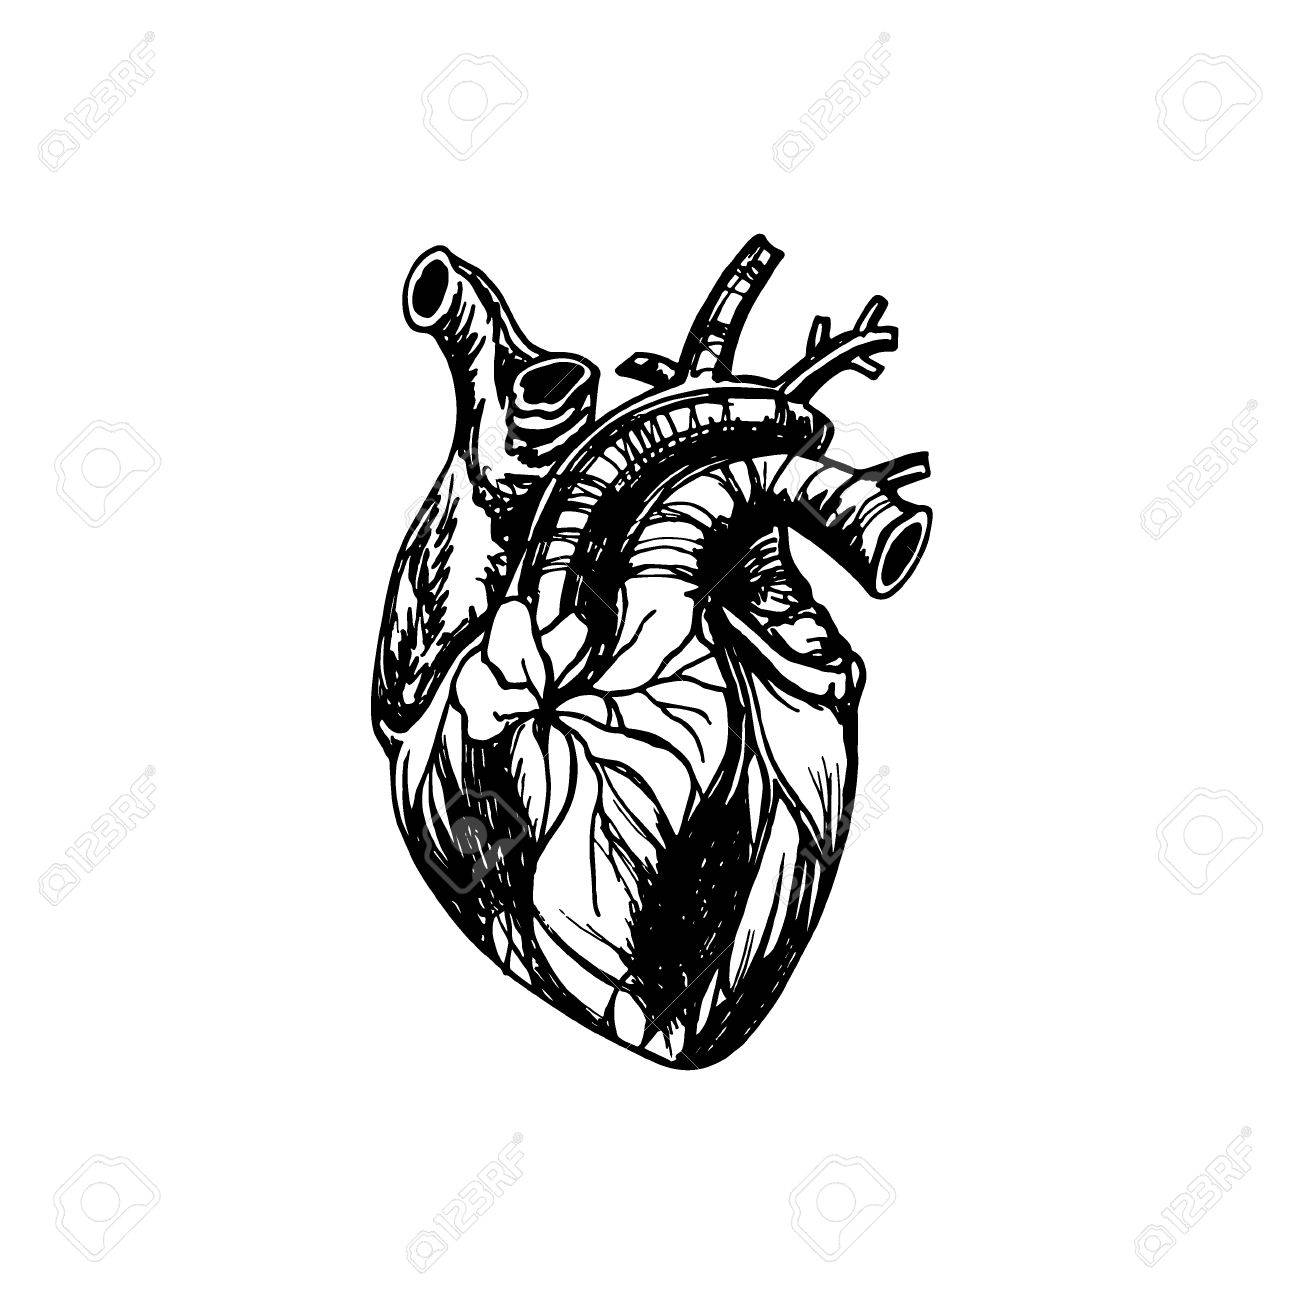 1300x1300 Vector Illustration Of Human Heart. Anatomy Drawing Made